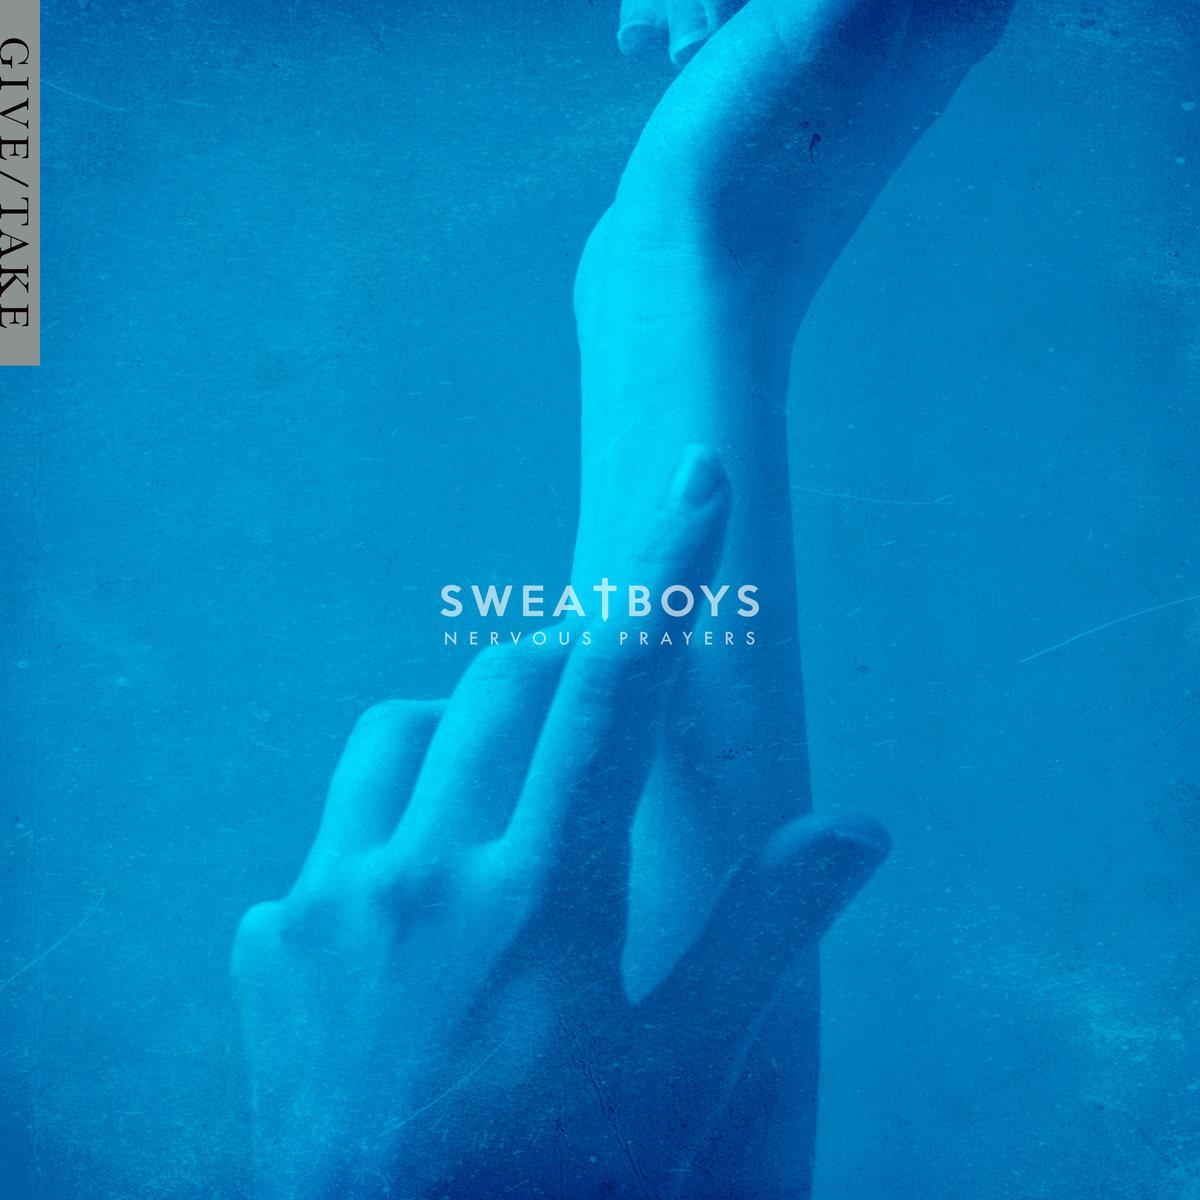 SweatBoys_NervousPrayers